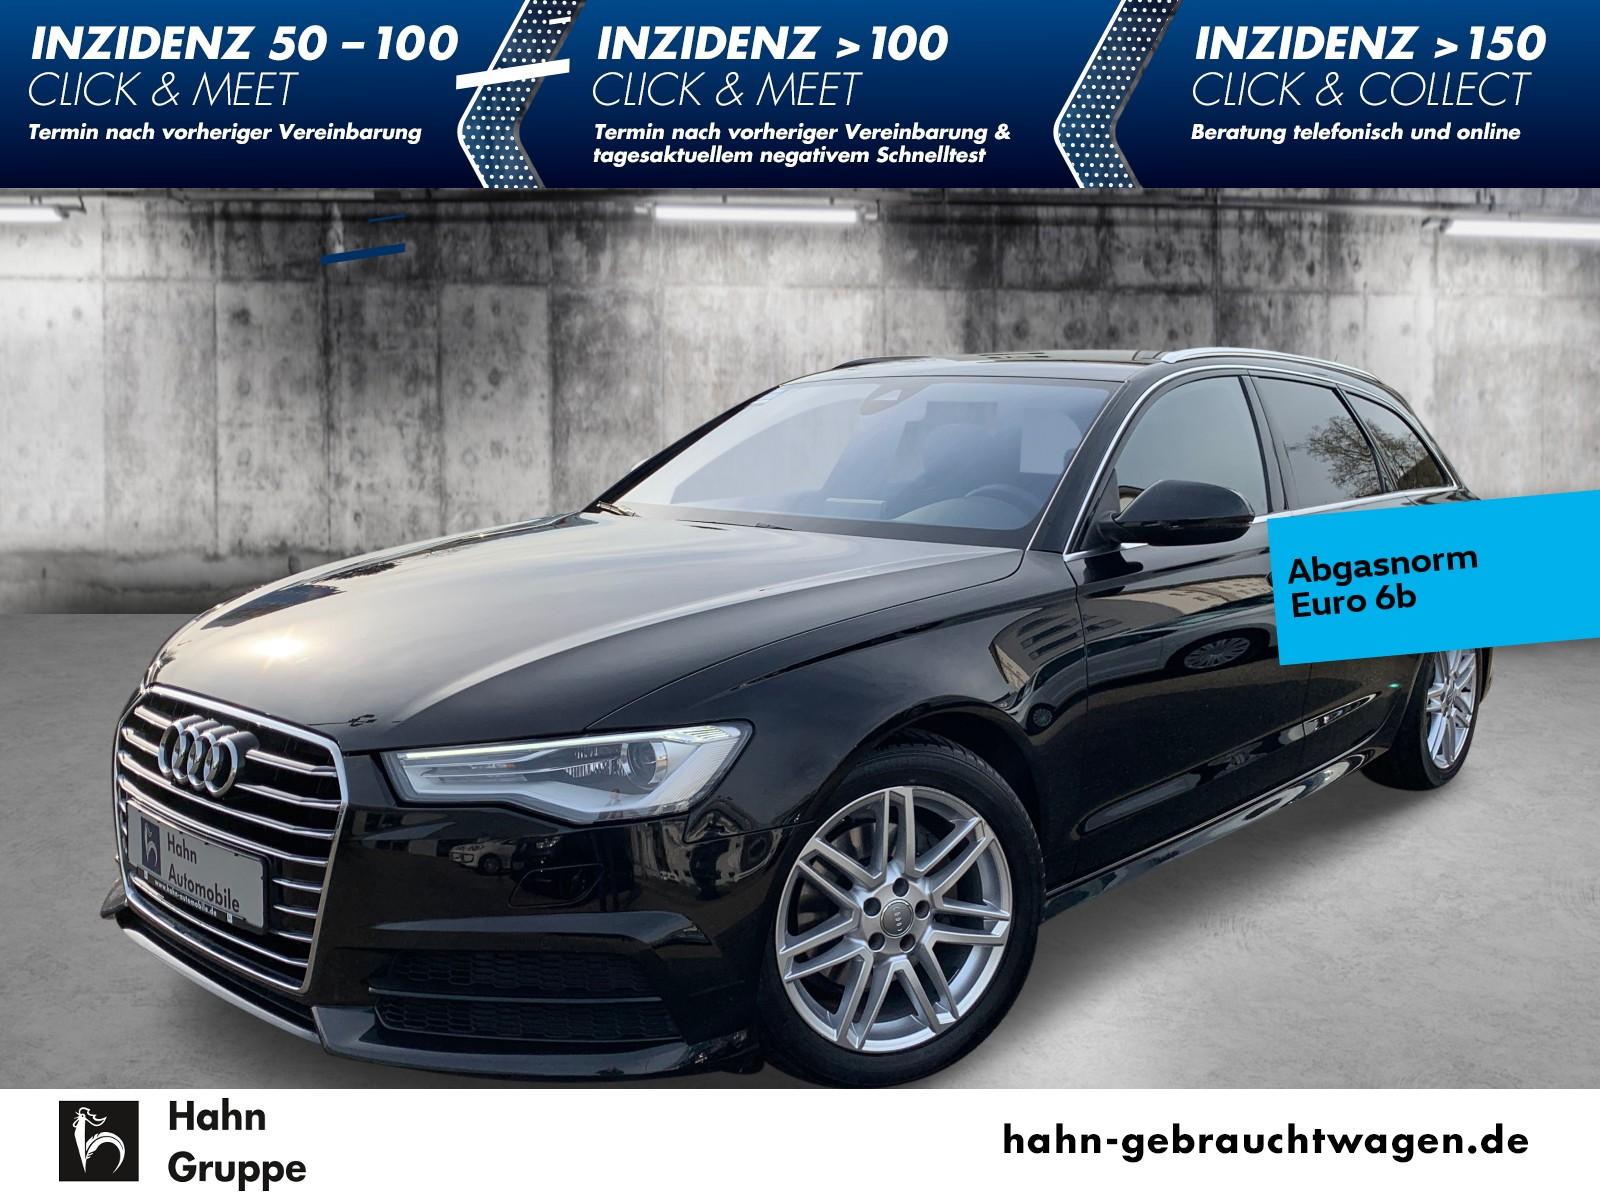 Audi A6 Avant 2,0TDI ultra Stronic Nav Xen Tempom RFK, Jahr 2017, Diesel